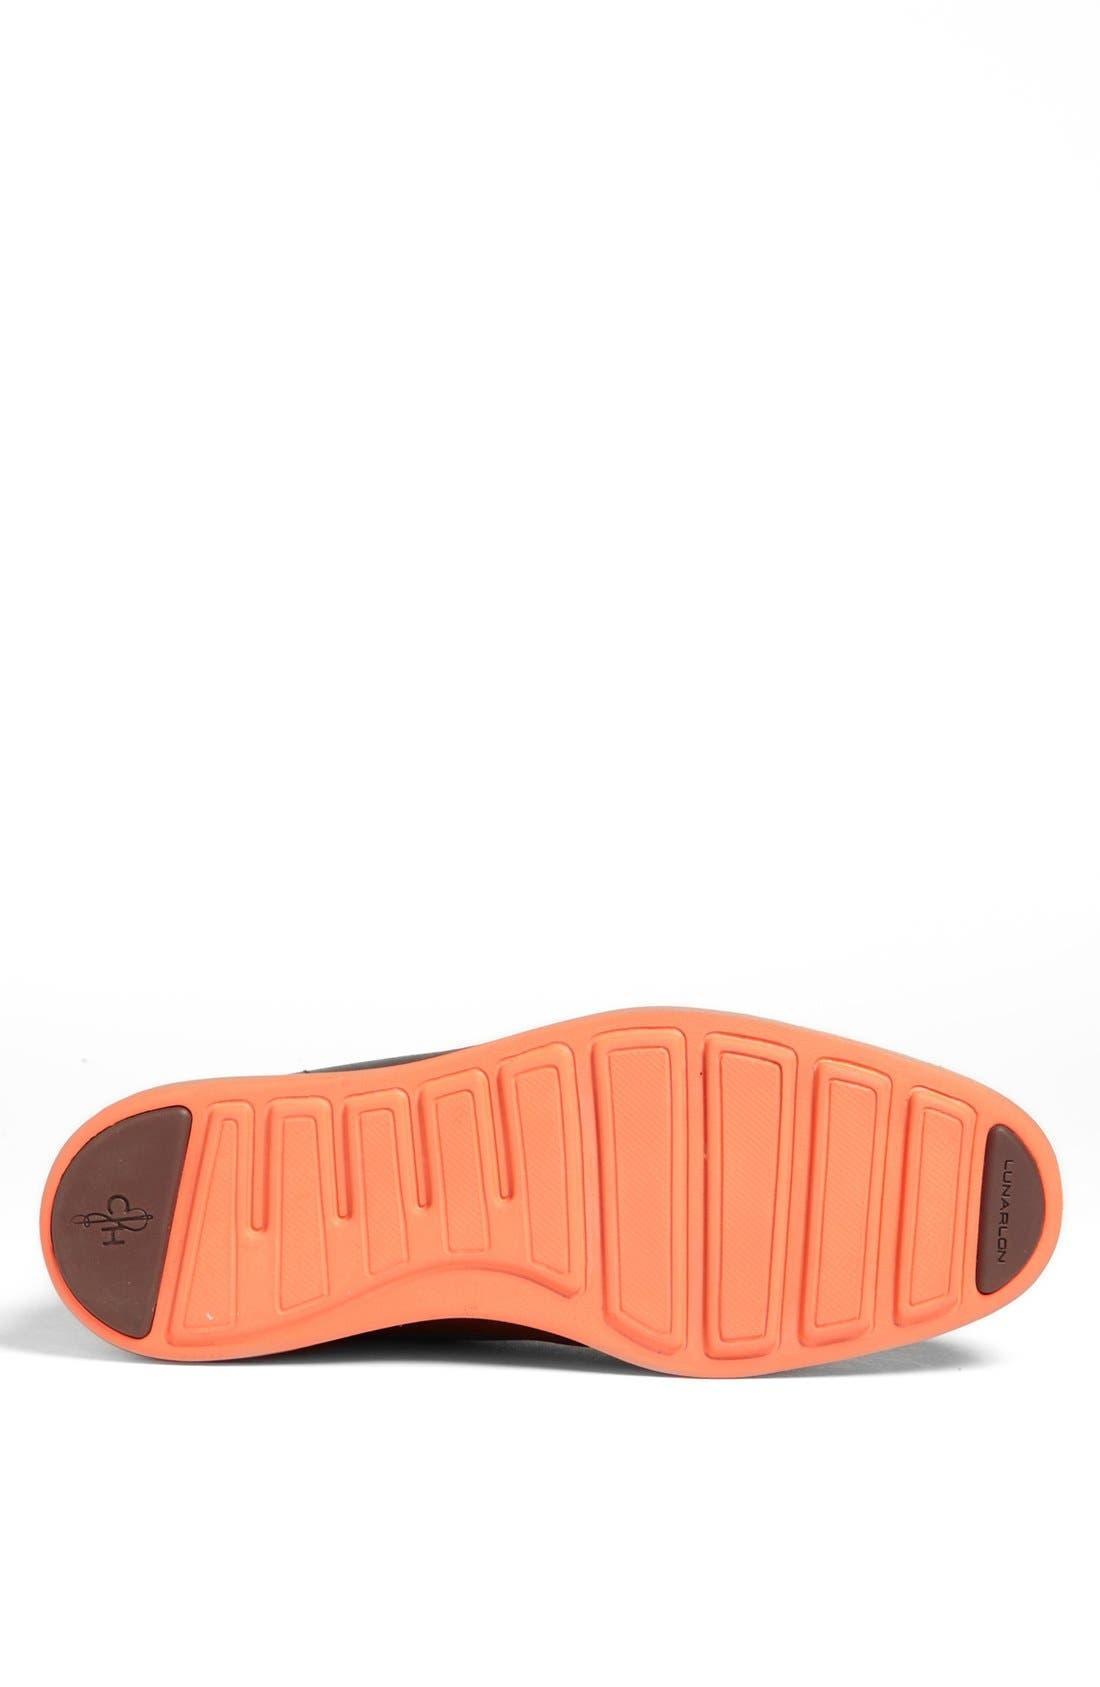 Alternate Image 4  - Cole Haan 'LunarGrand' Chukka Boot